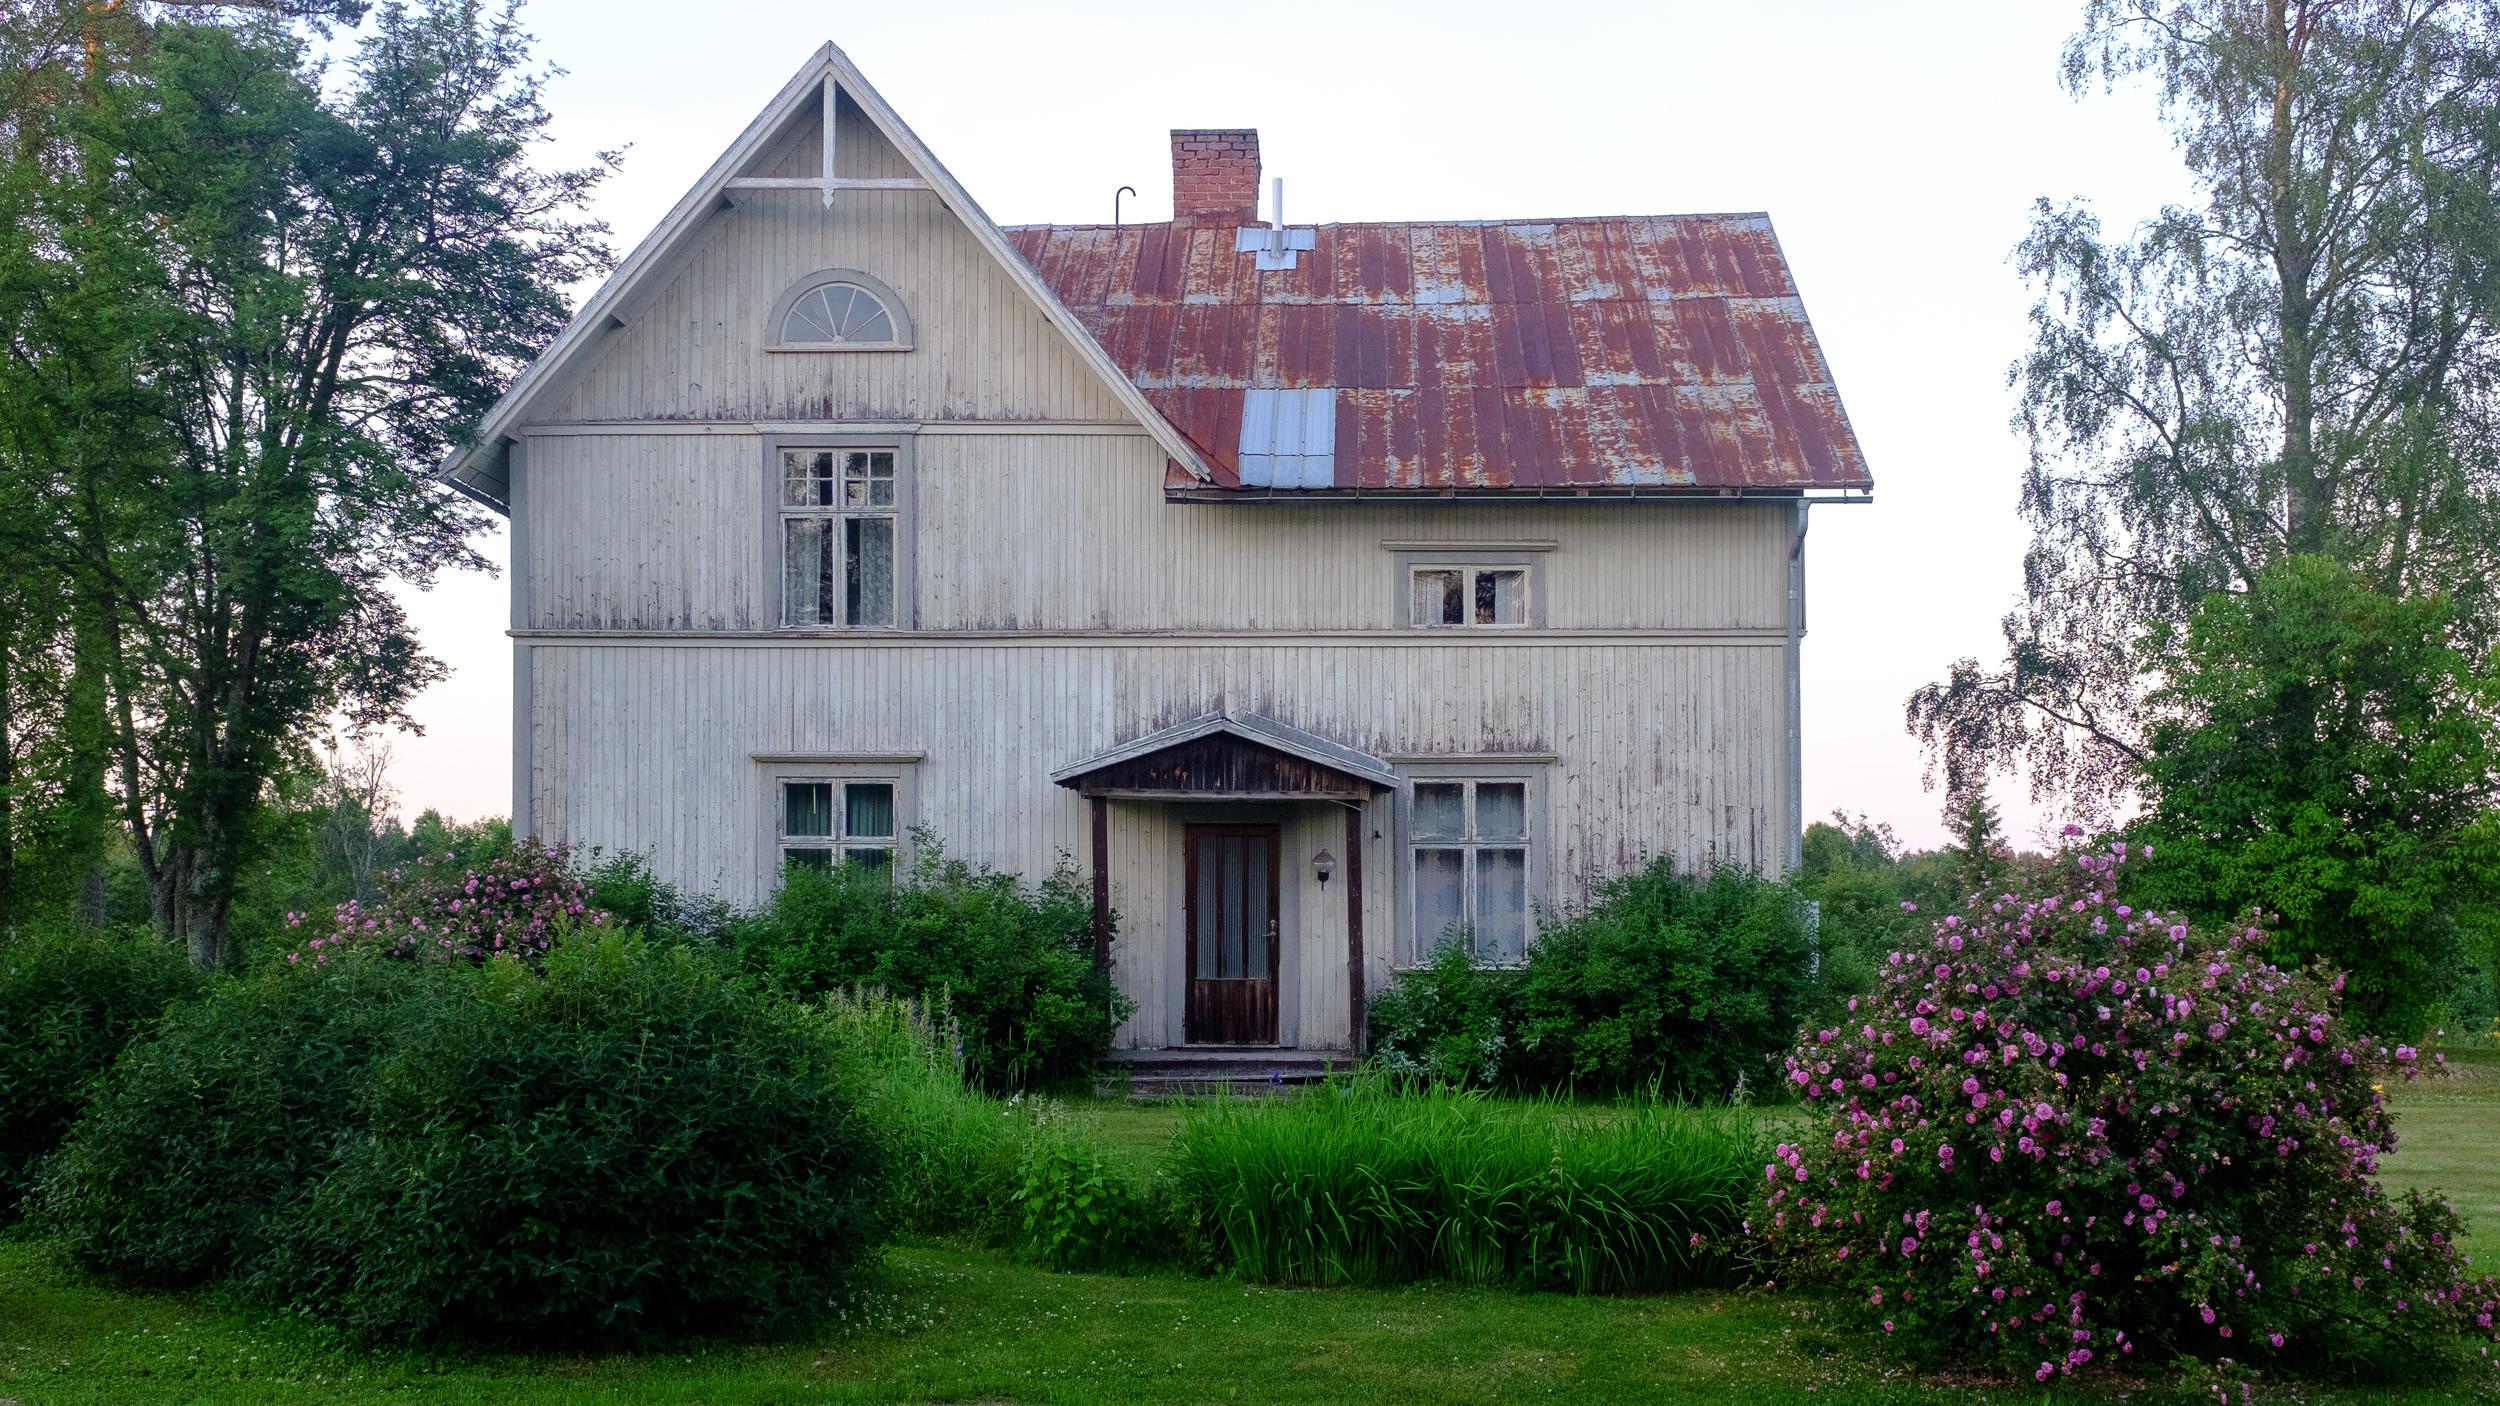 Norrland-5524.jpg